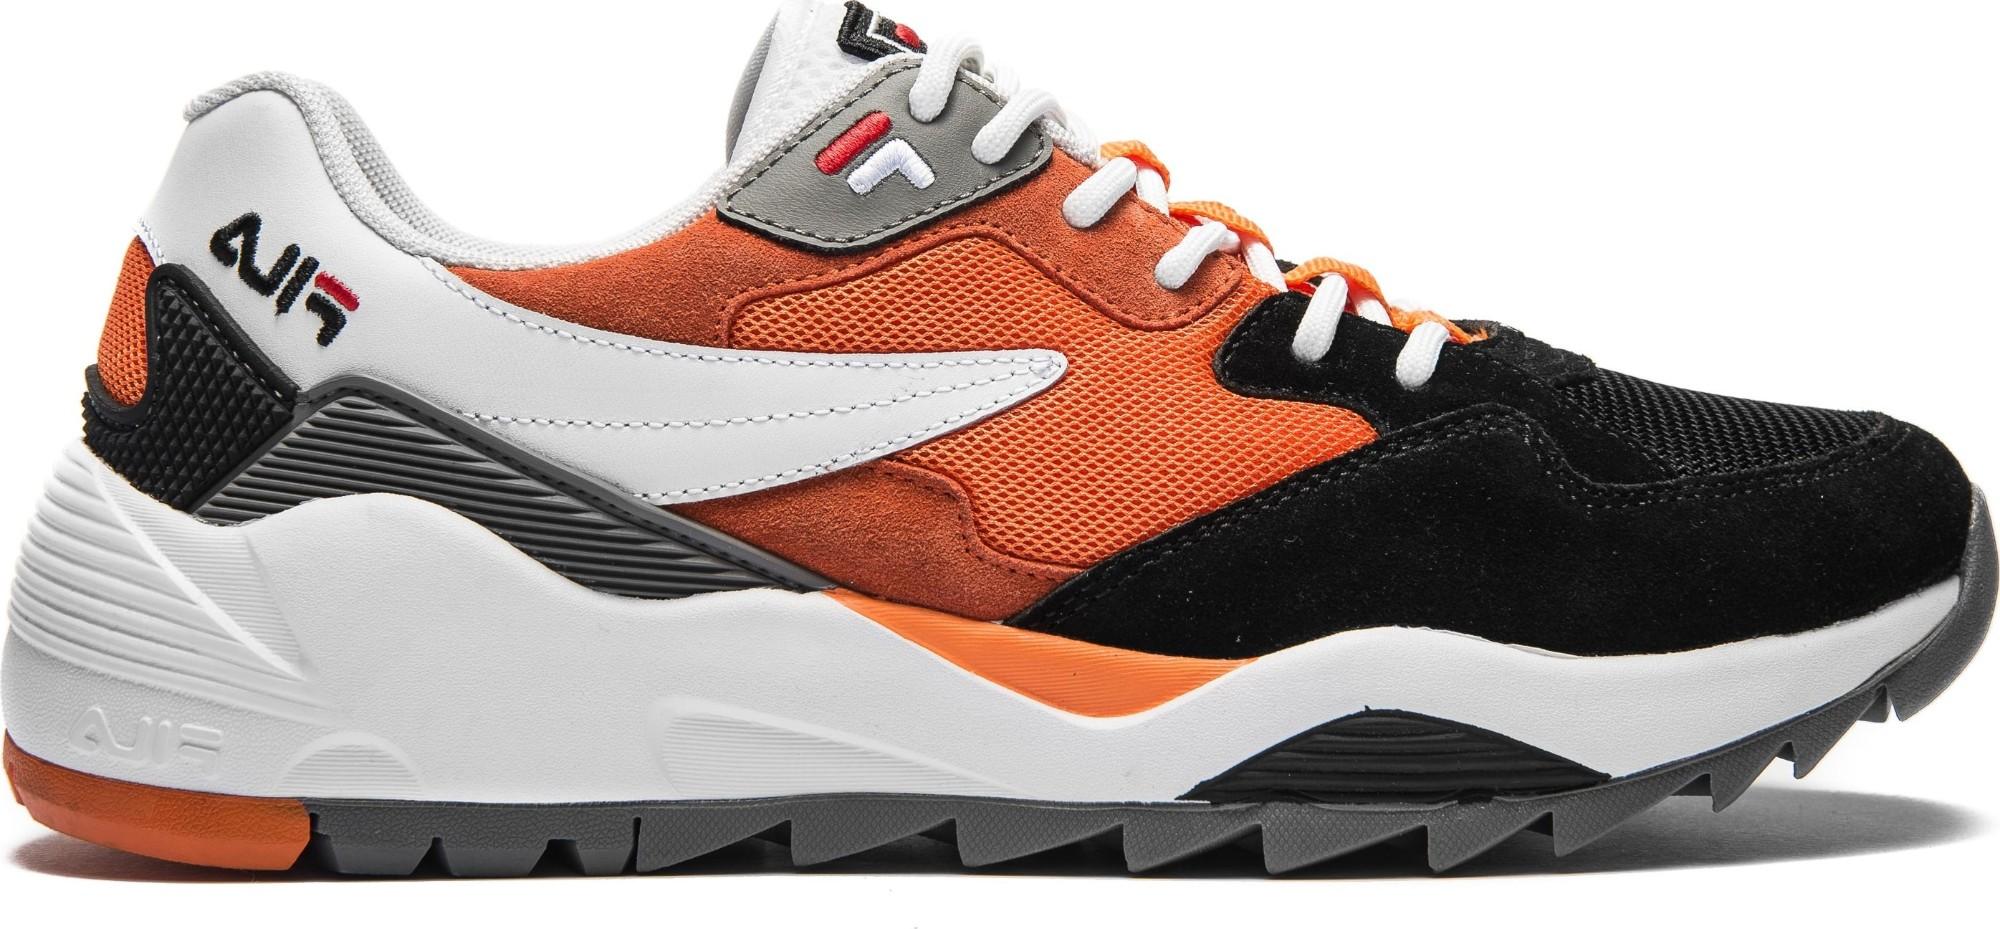 FILA Vault CMR Jogger CB Low White/Black/Mandarin Orange 41